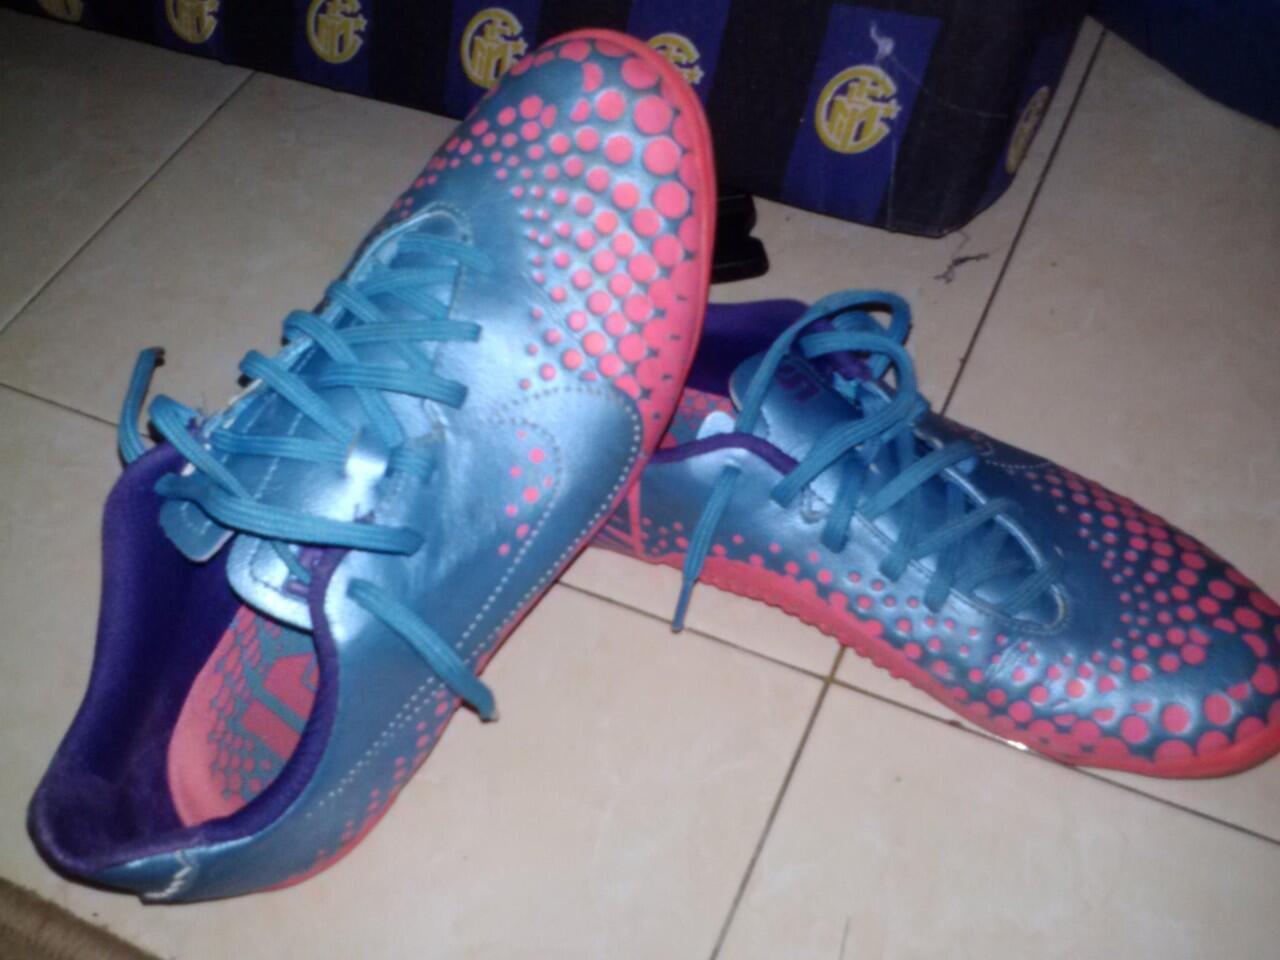 Terjual jual sepatu futsal nike elastico finale original kaskus jpg  1280x960 Sepatu futsal nike elastico 3ef291bd4e